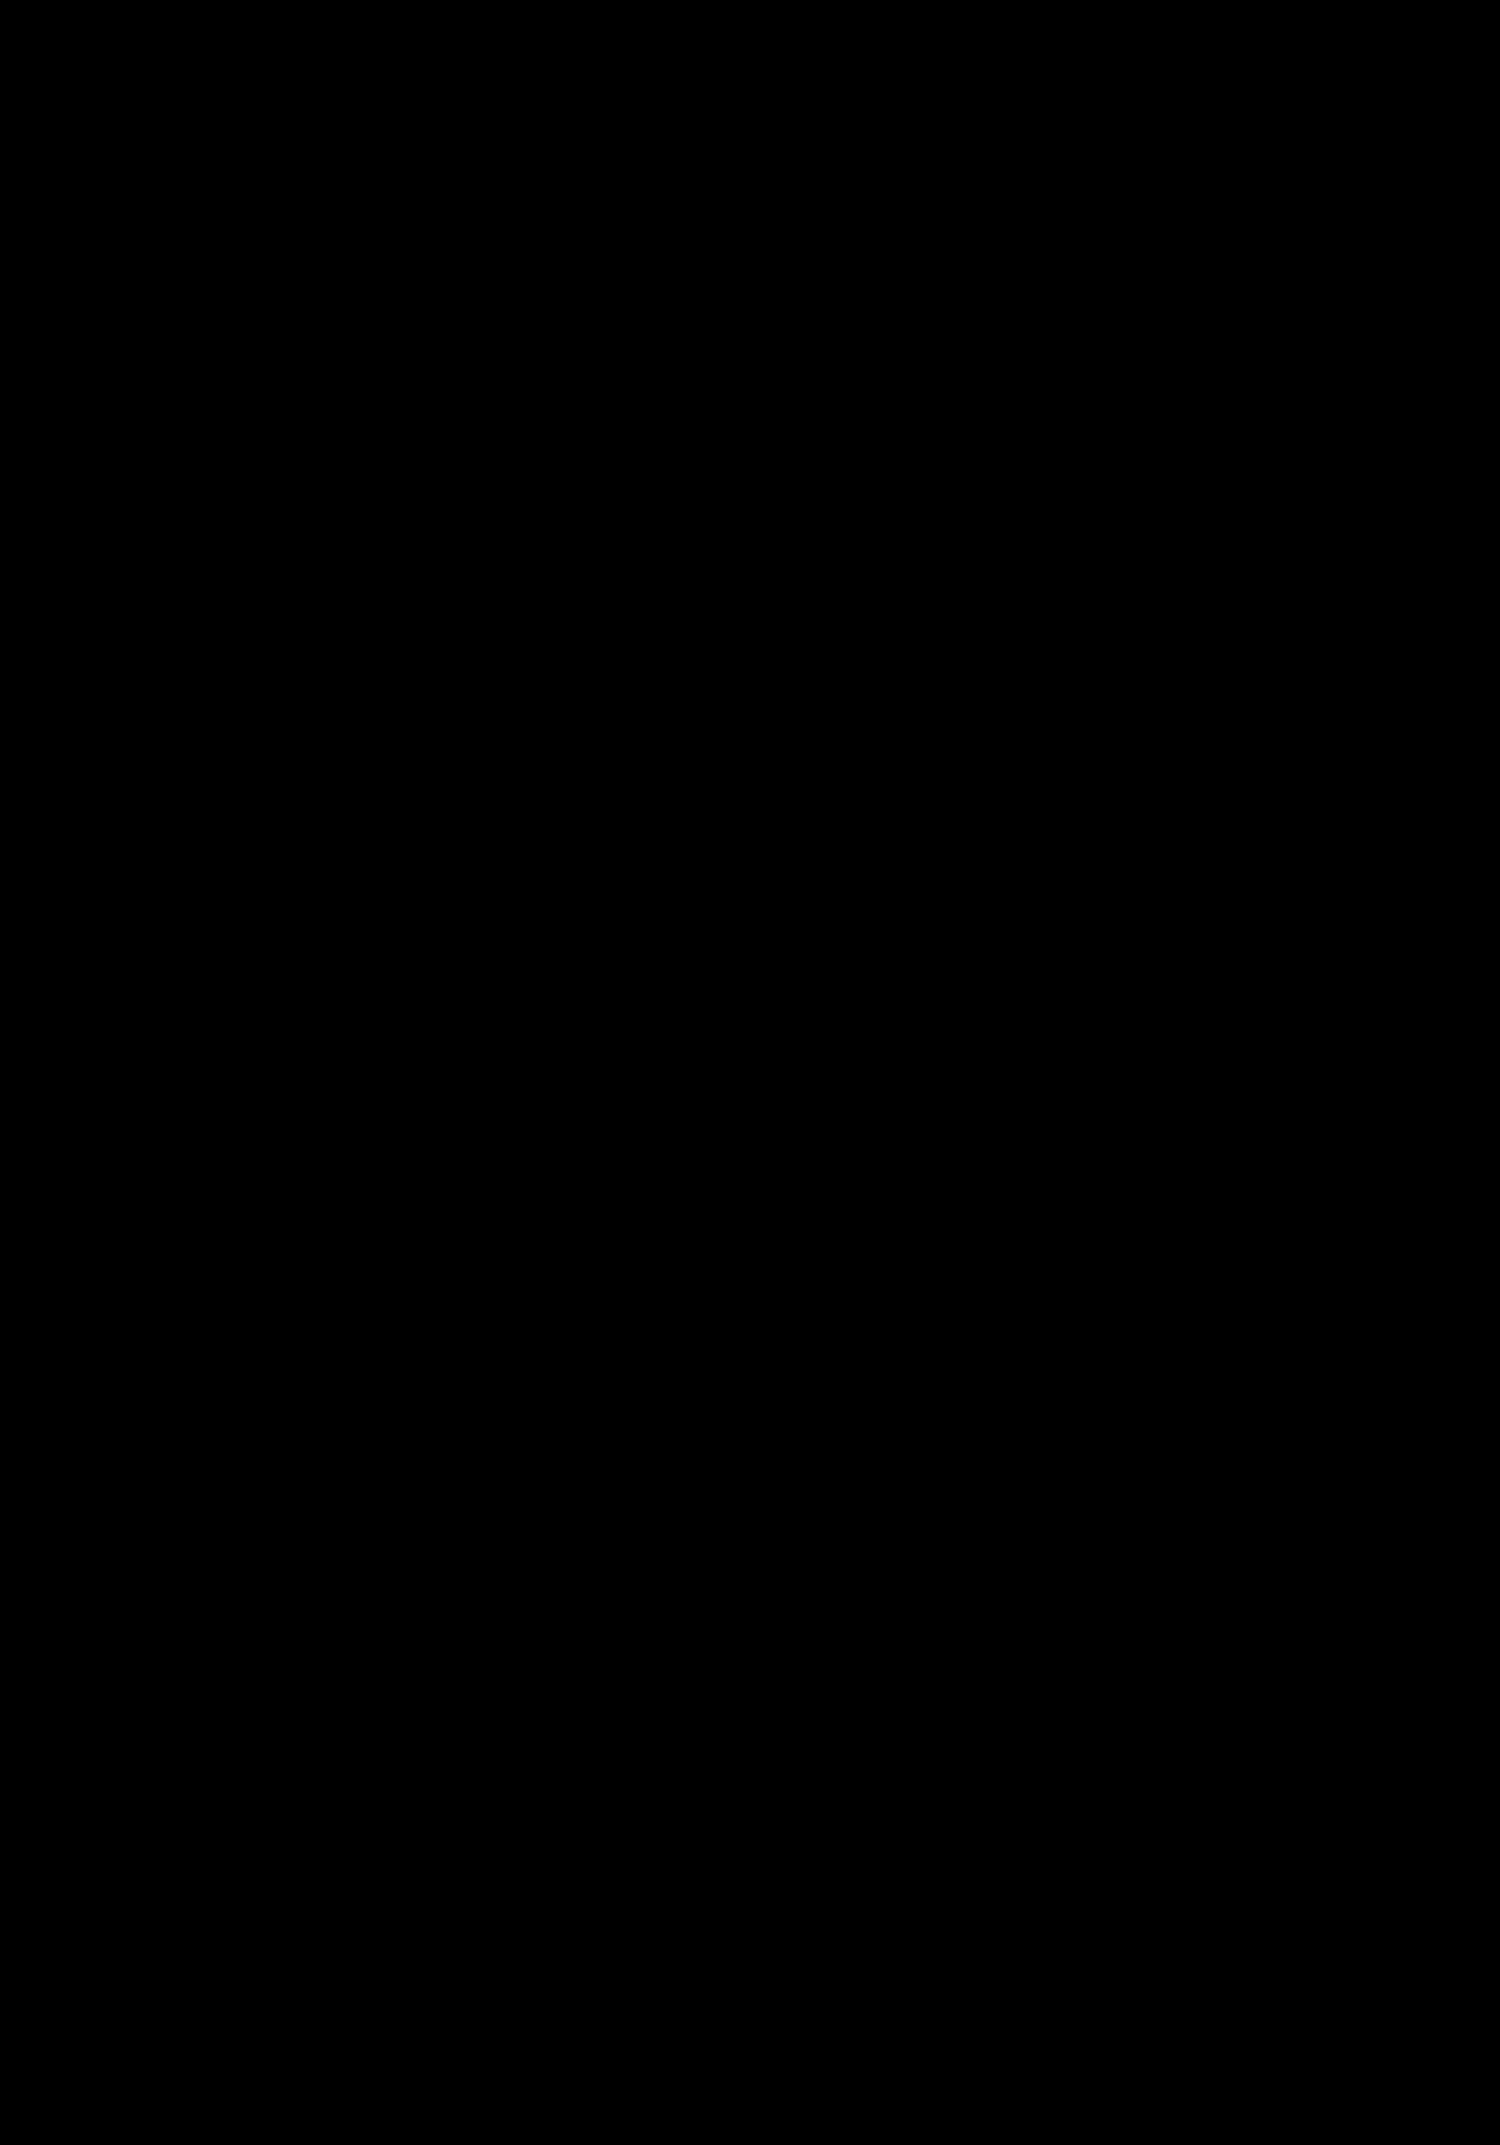 mg_2467